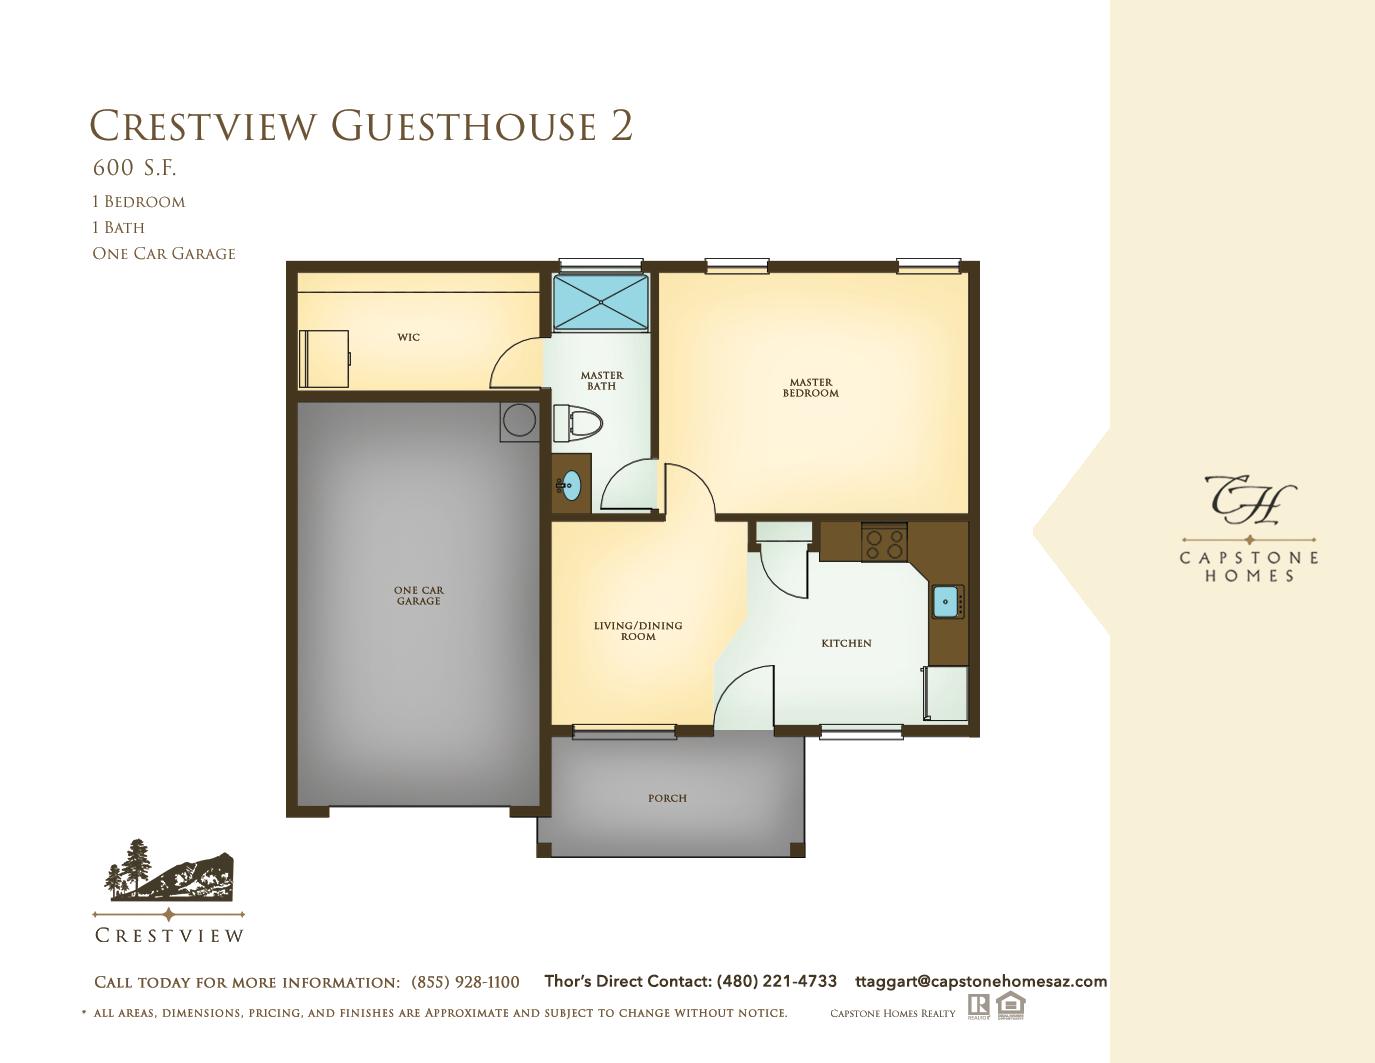 CVGuesthouse2Floorplan